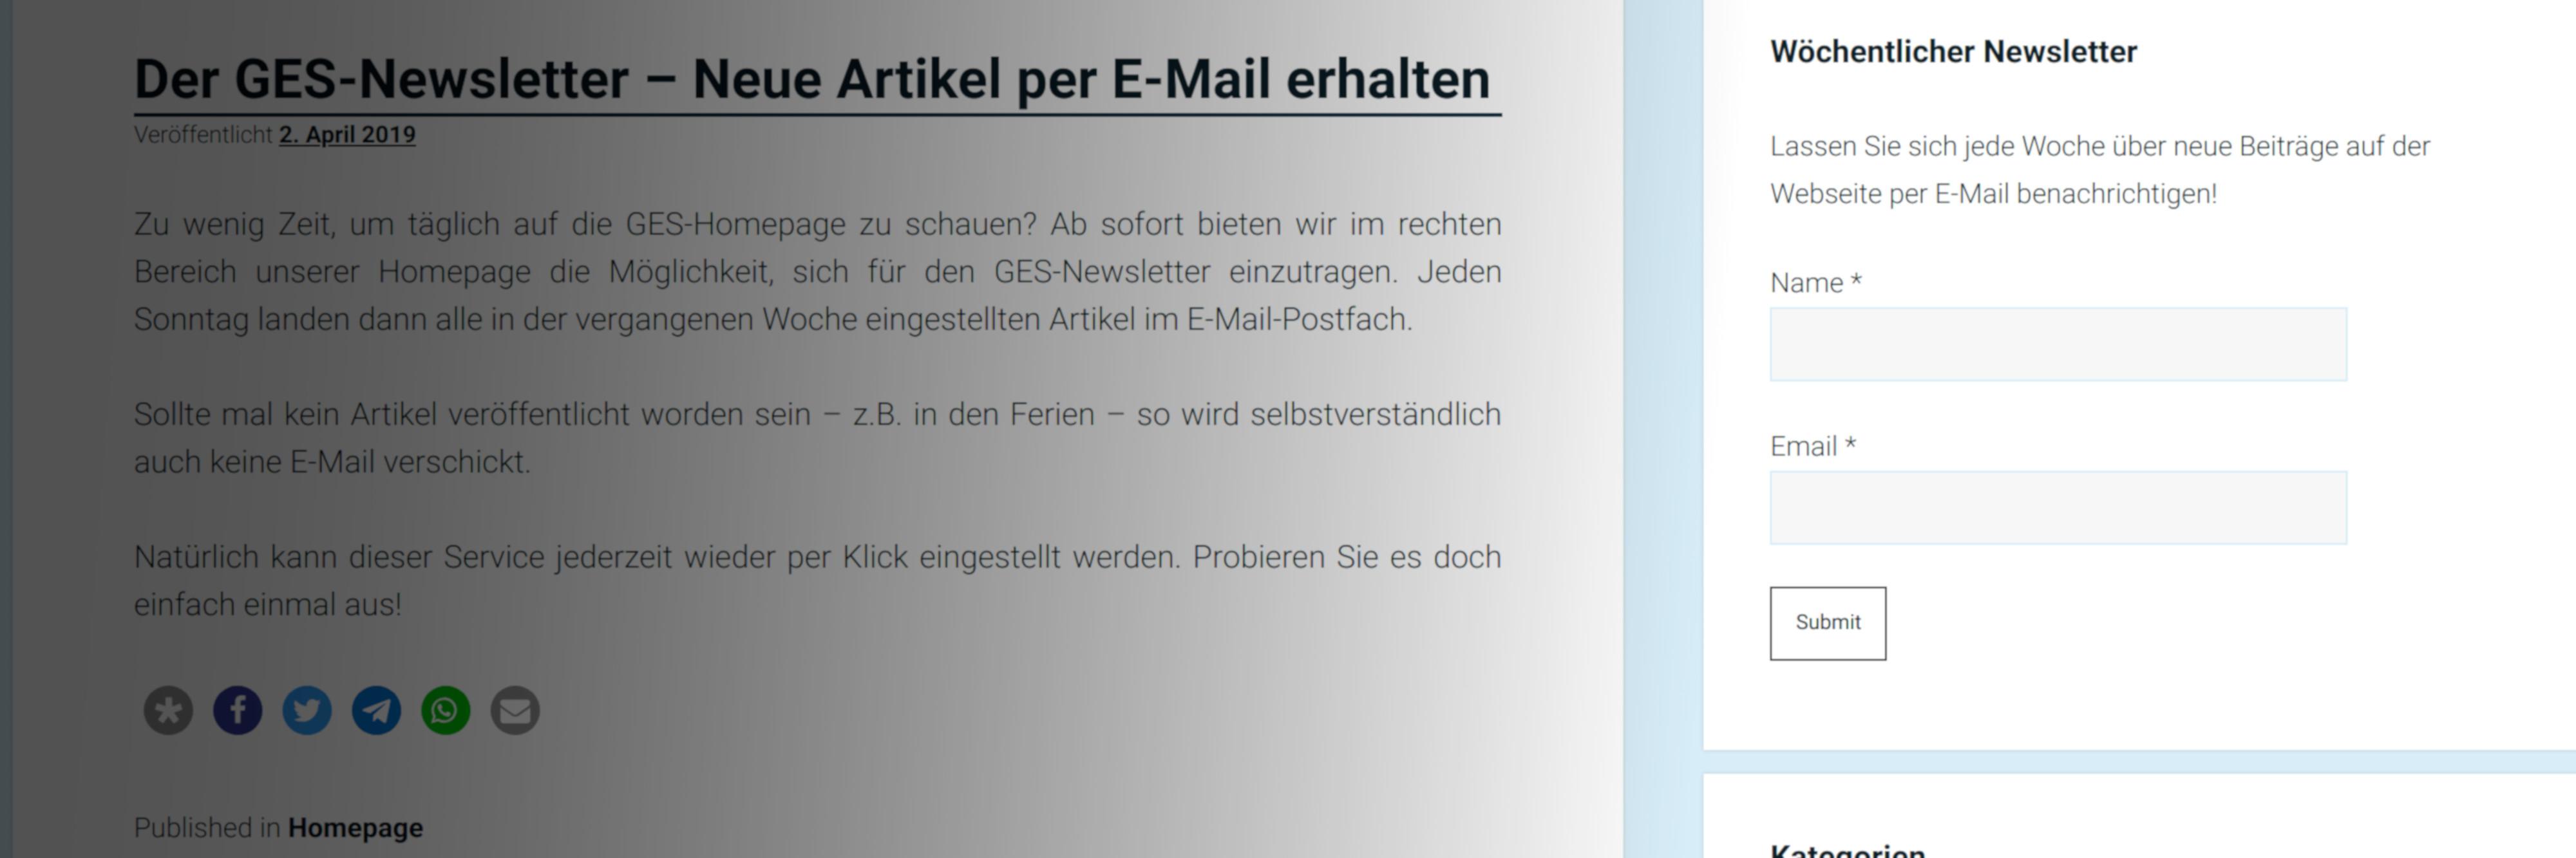 Suche nach Webseiten per E-Mail